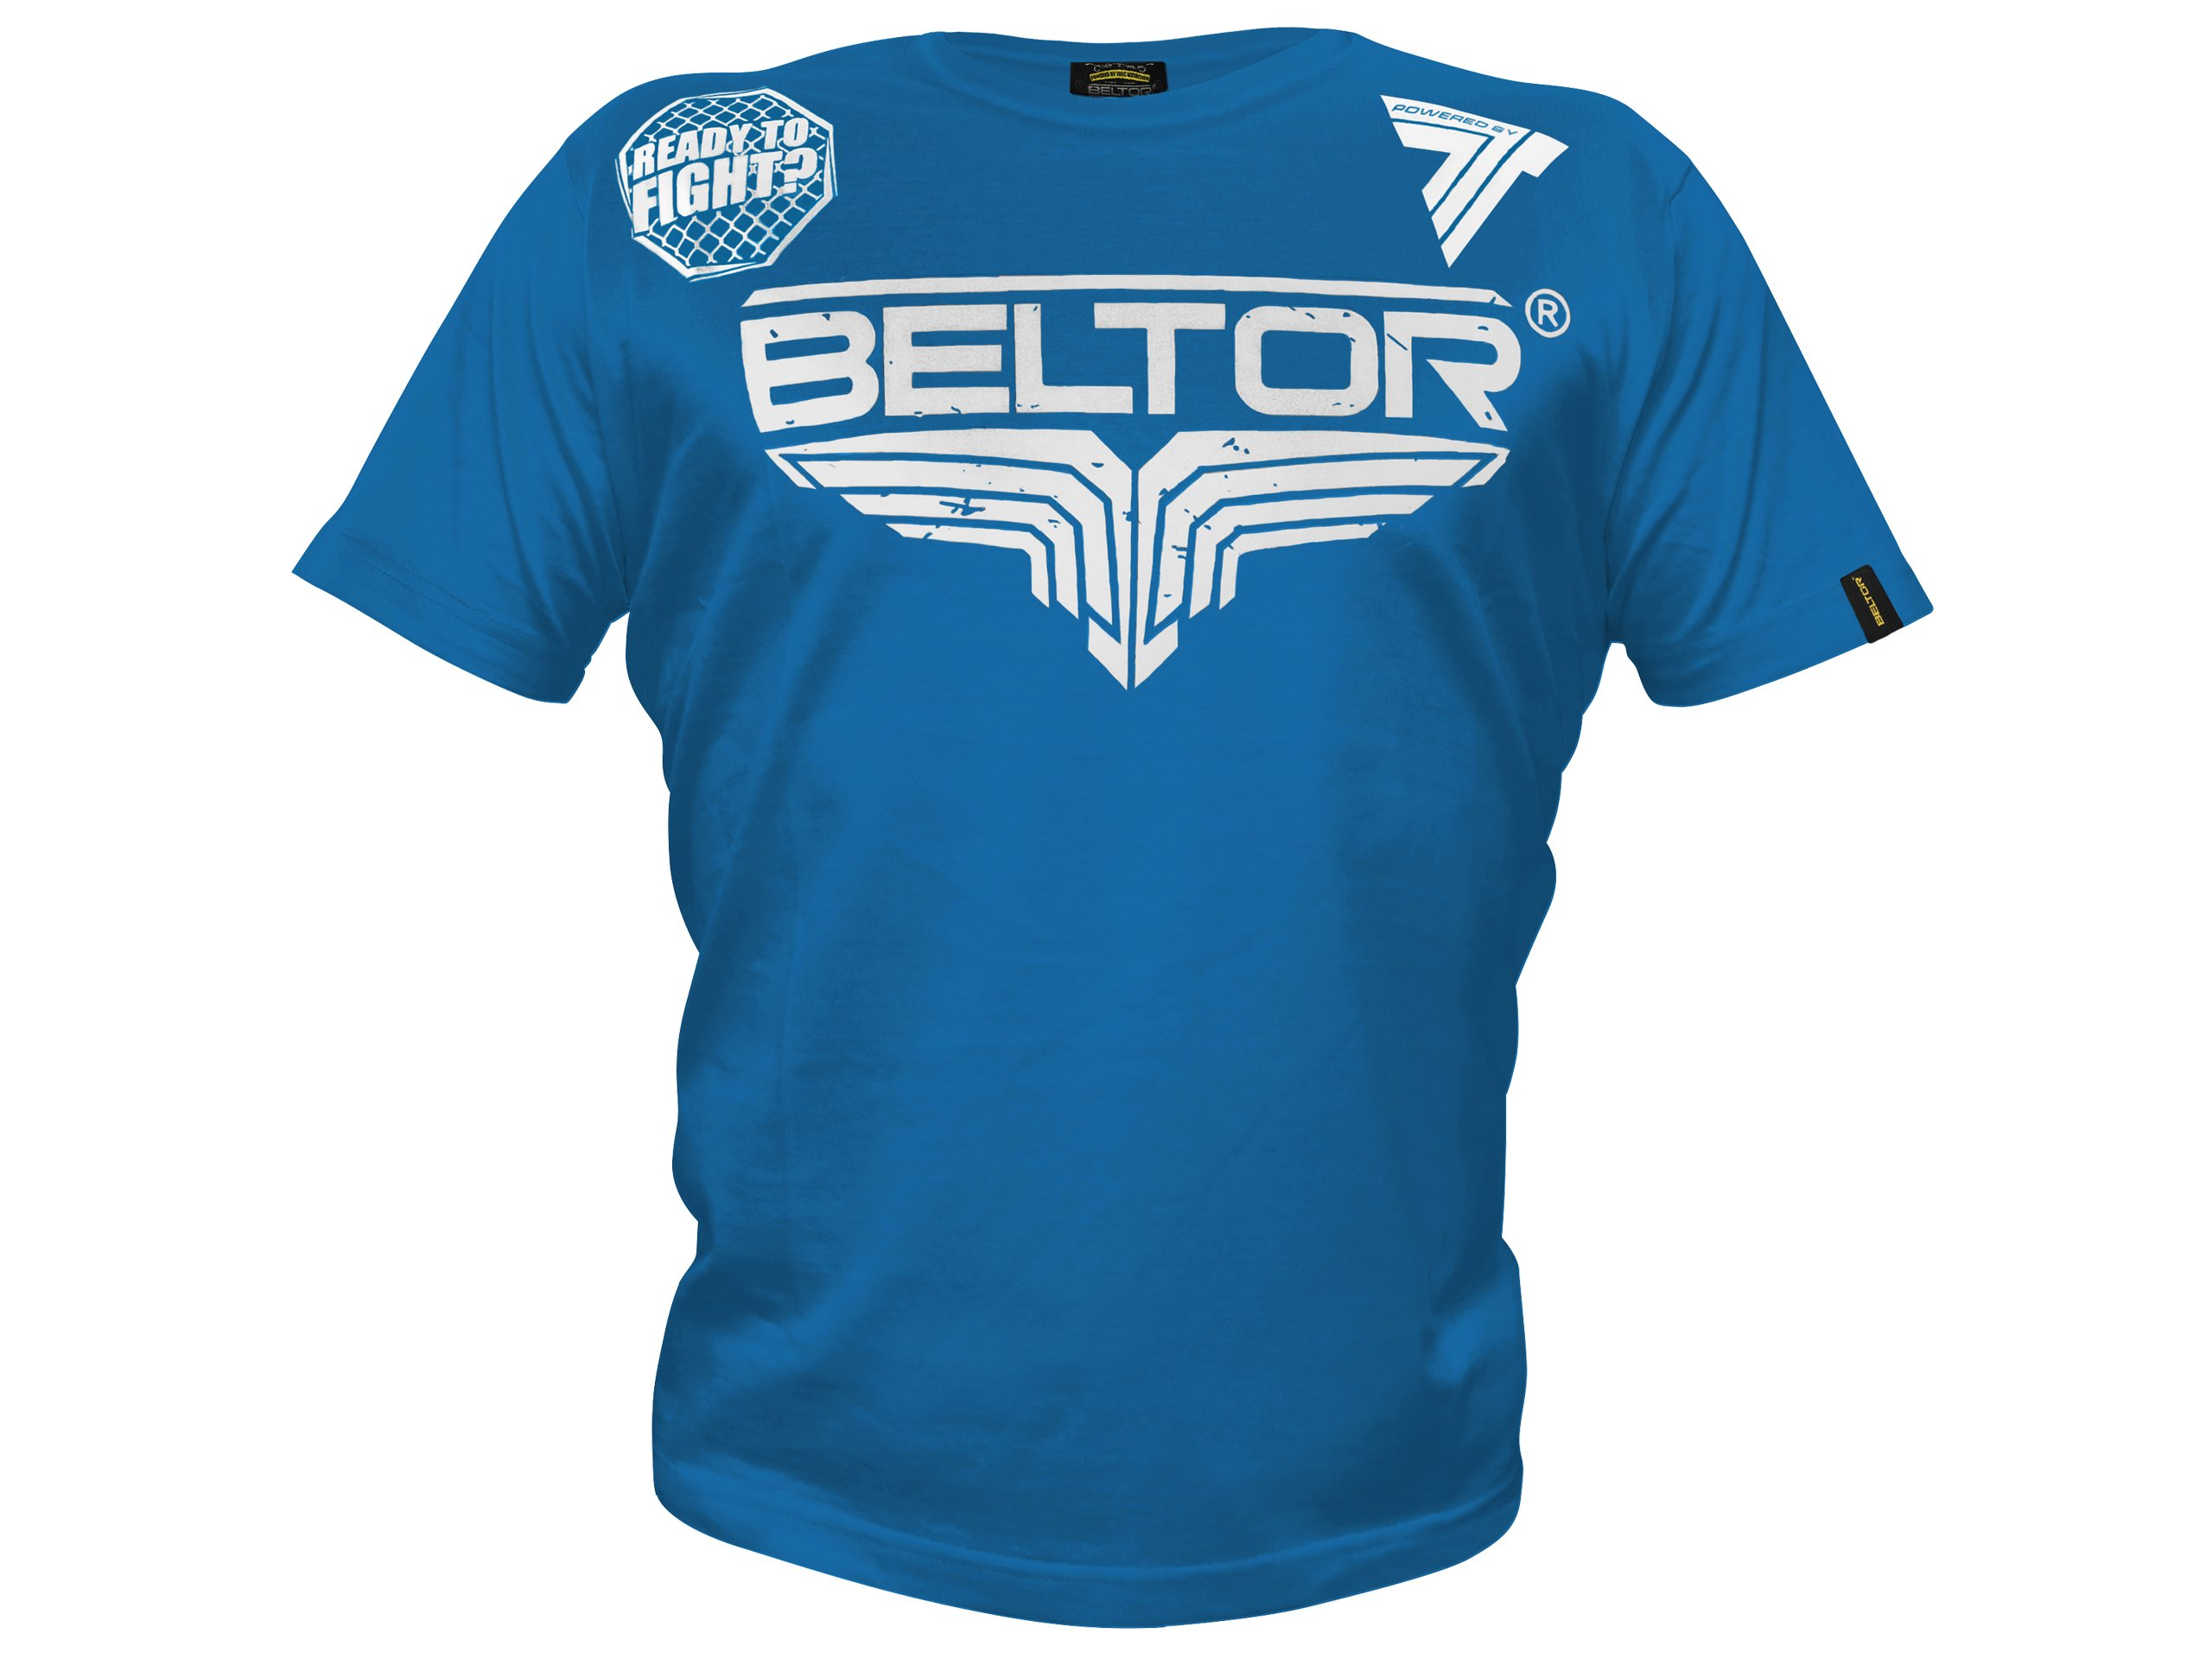 BELTOR BW T-shirt Octagon blue veľkosť M